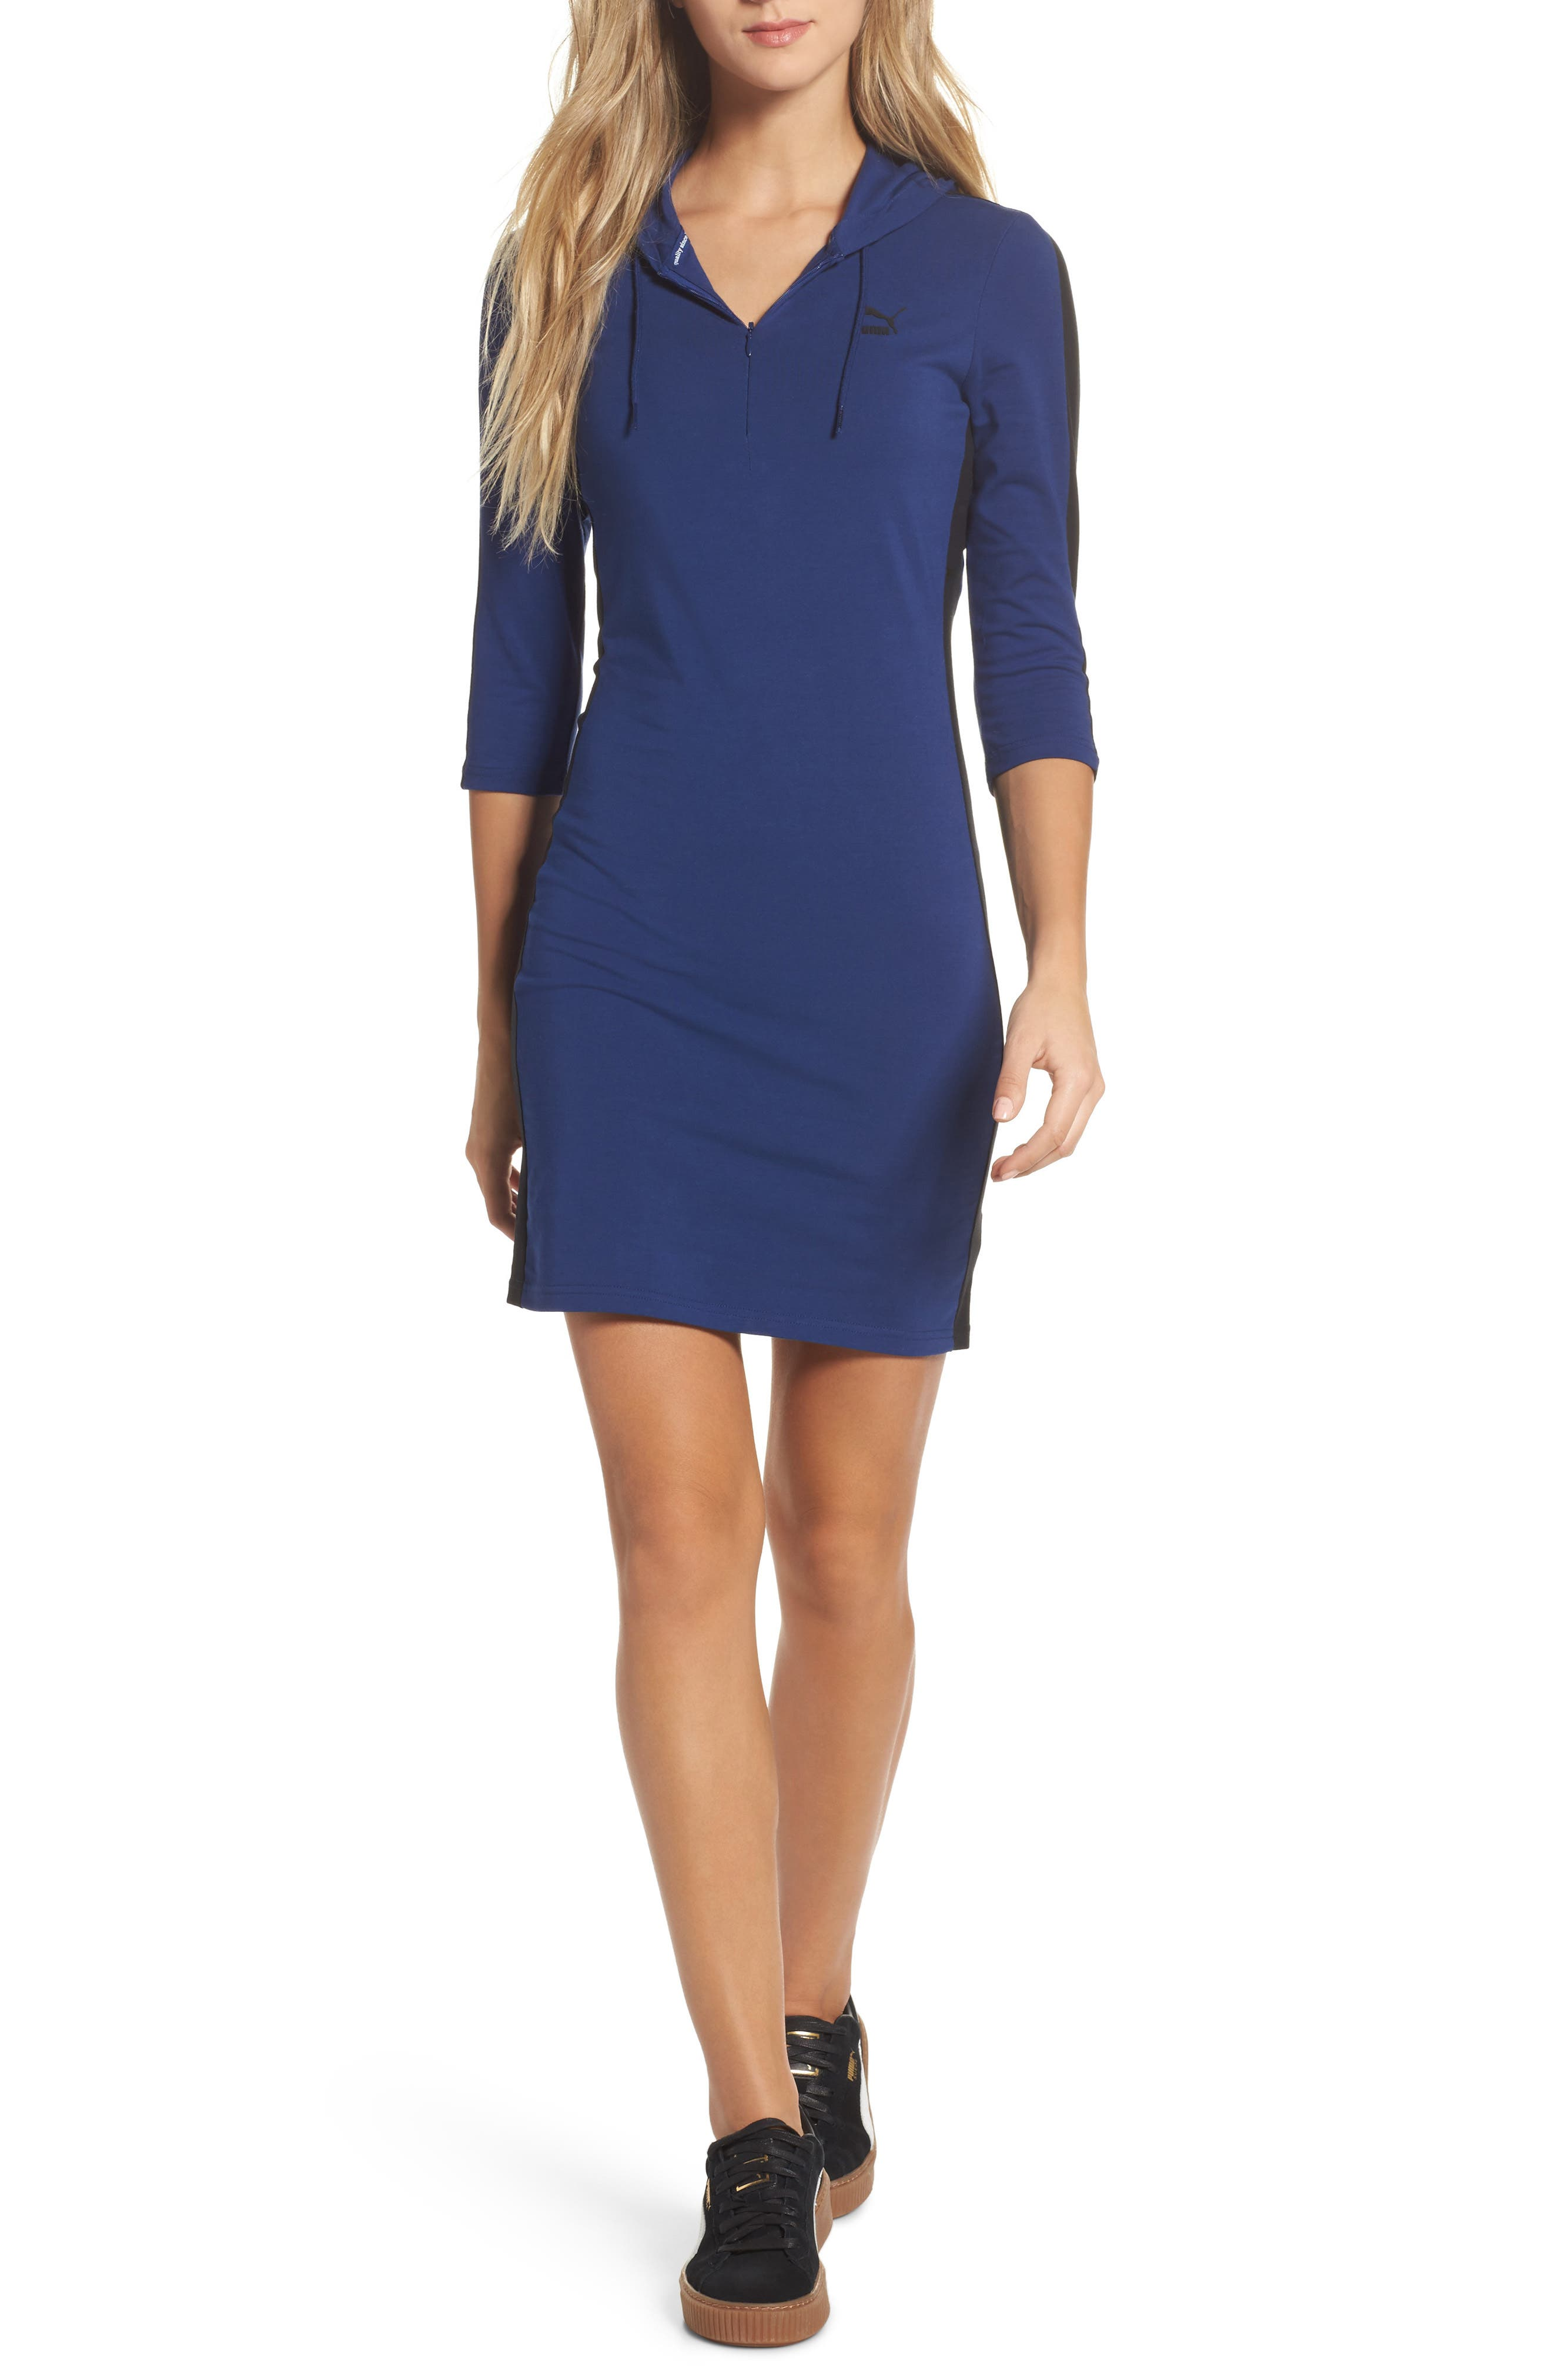 T7 Sweatshirt Dress,                         Main,                         color, 400